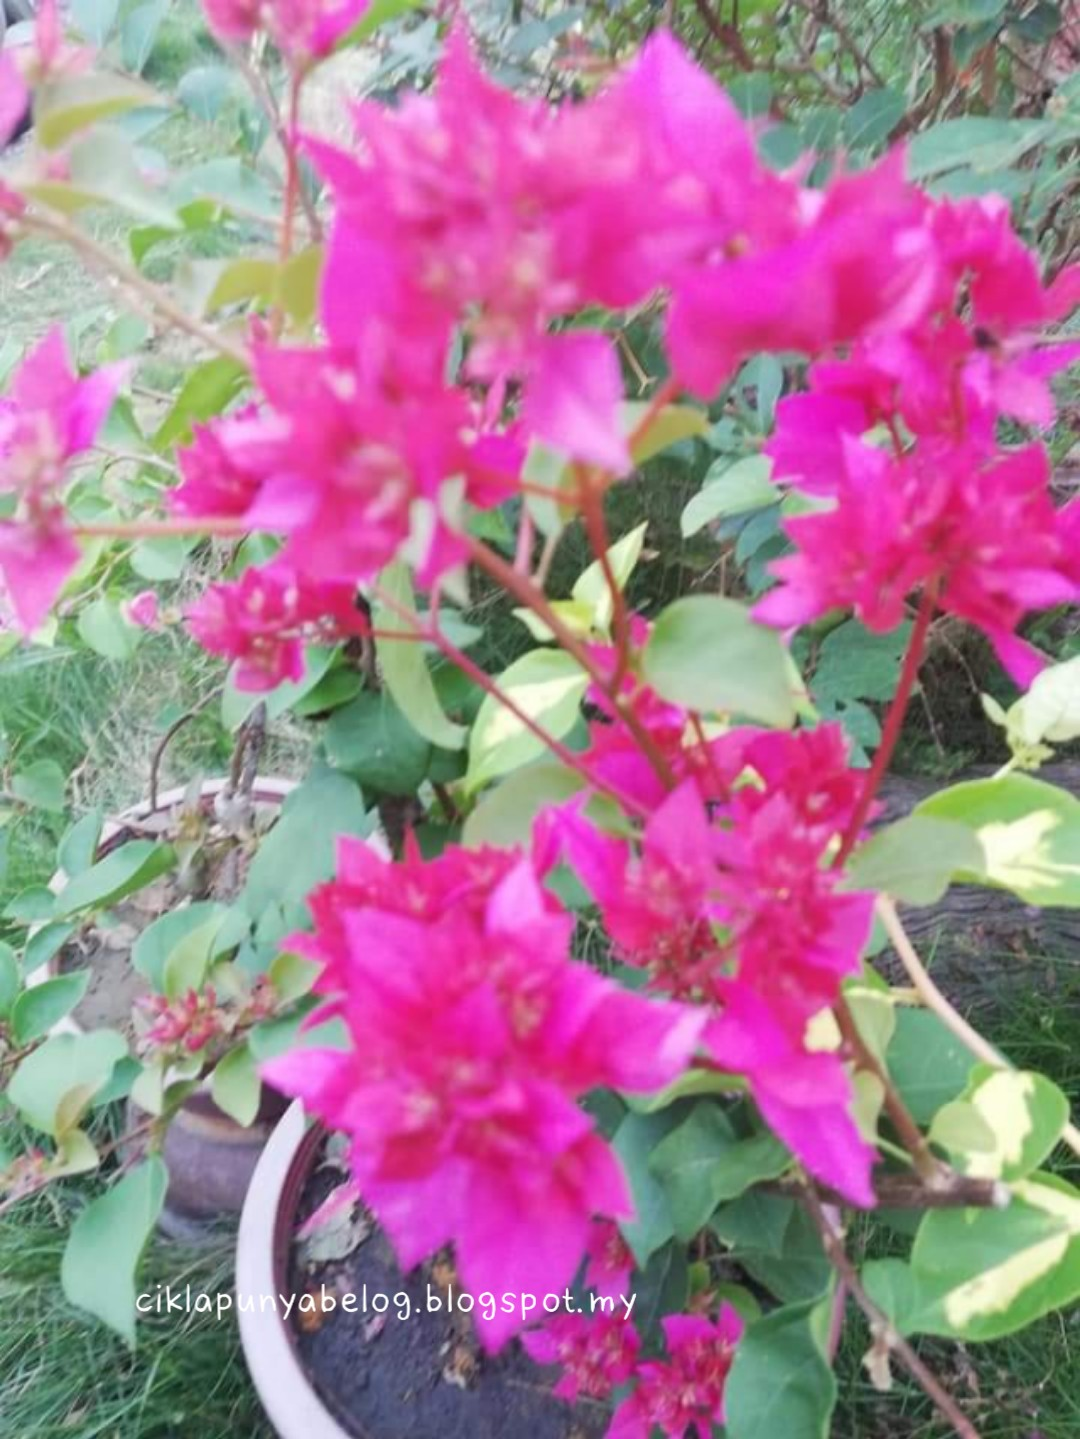 [Entri bergambar] : Tengok bunga cantik, terapi mata.